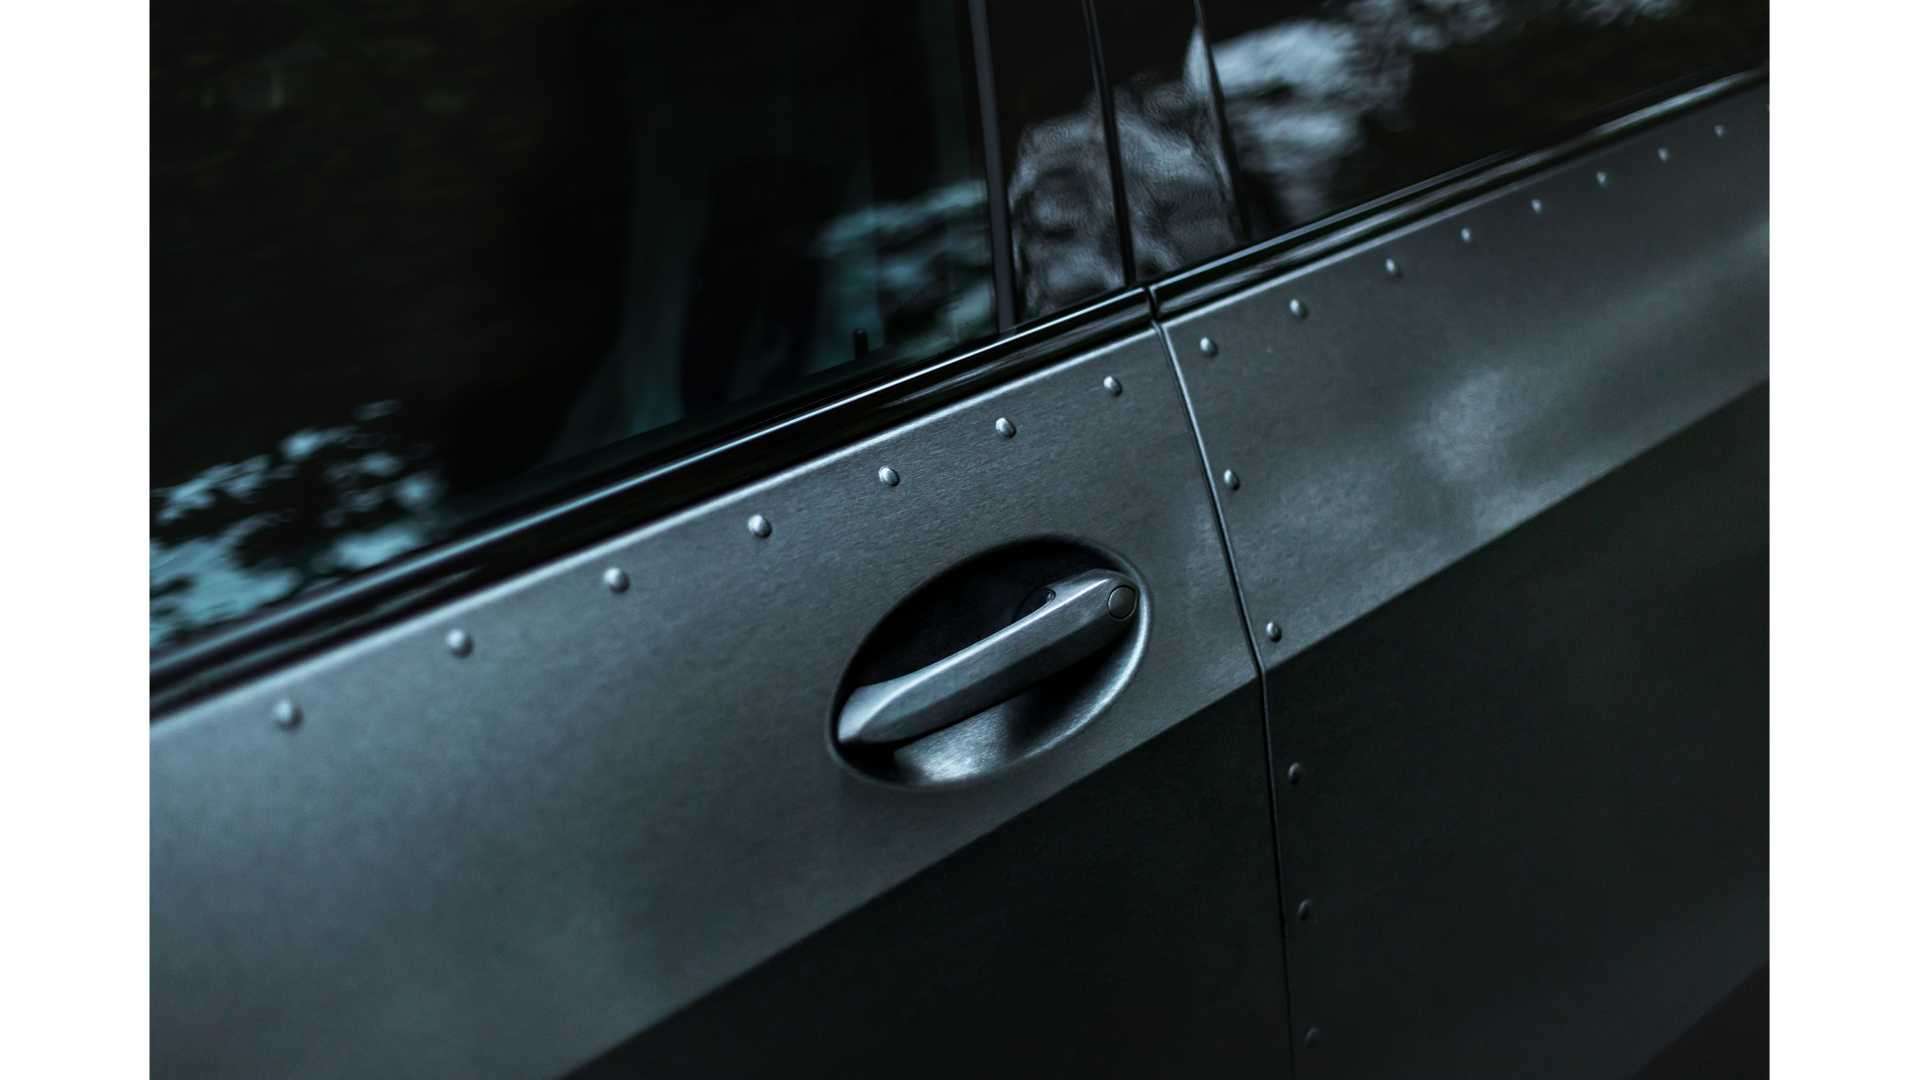 BMW-X7-Dirt-Edition-By-Manhart-9